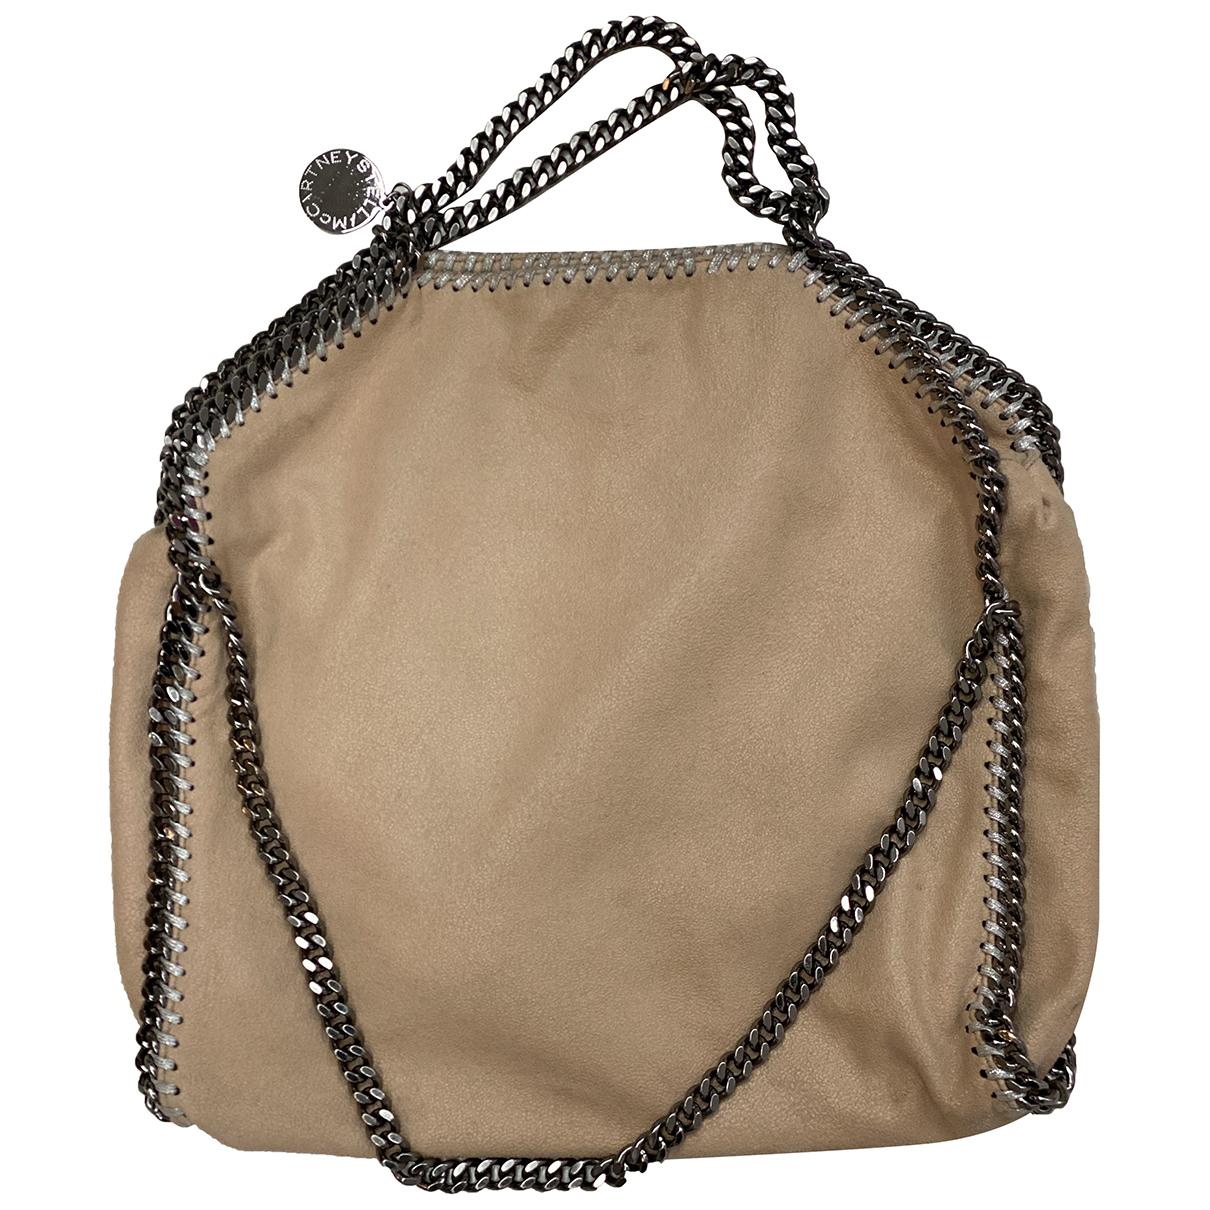 Stella Mccartney Falabella Pink Suede handbag for Women N